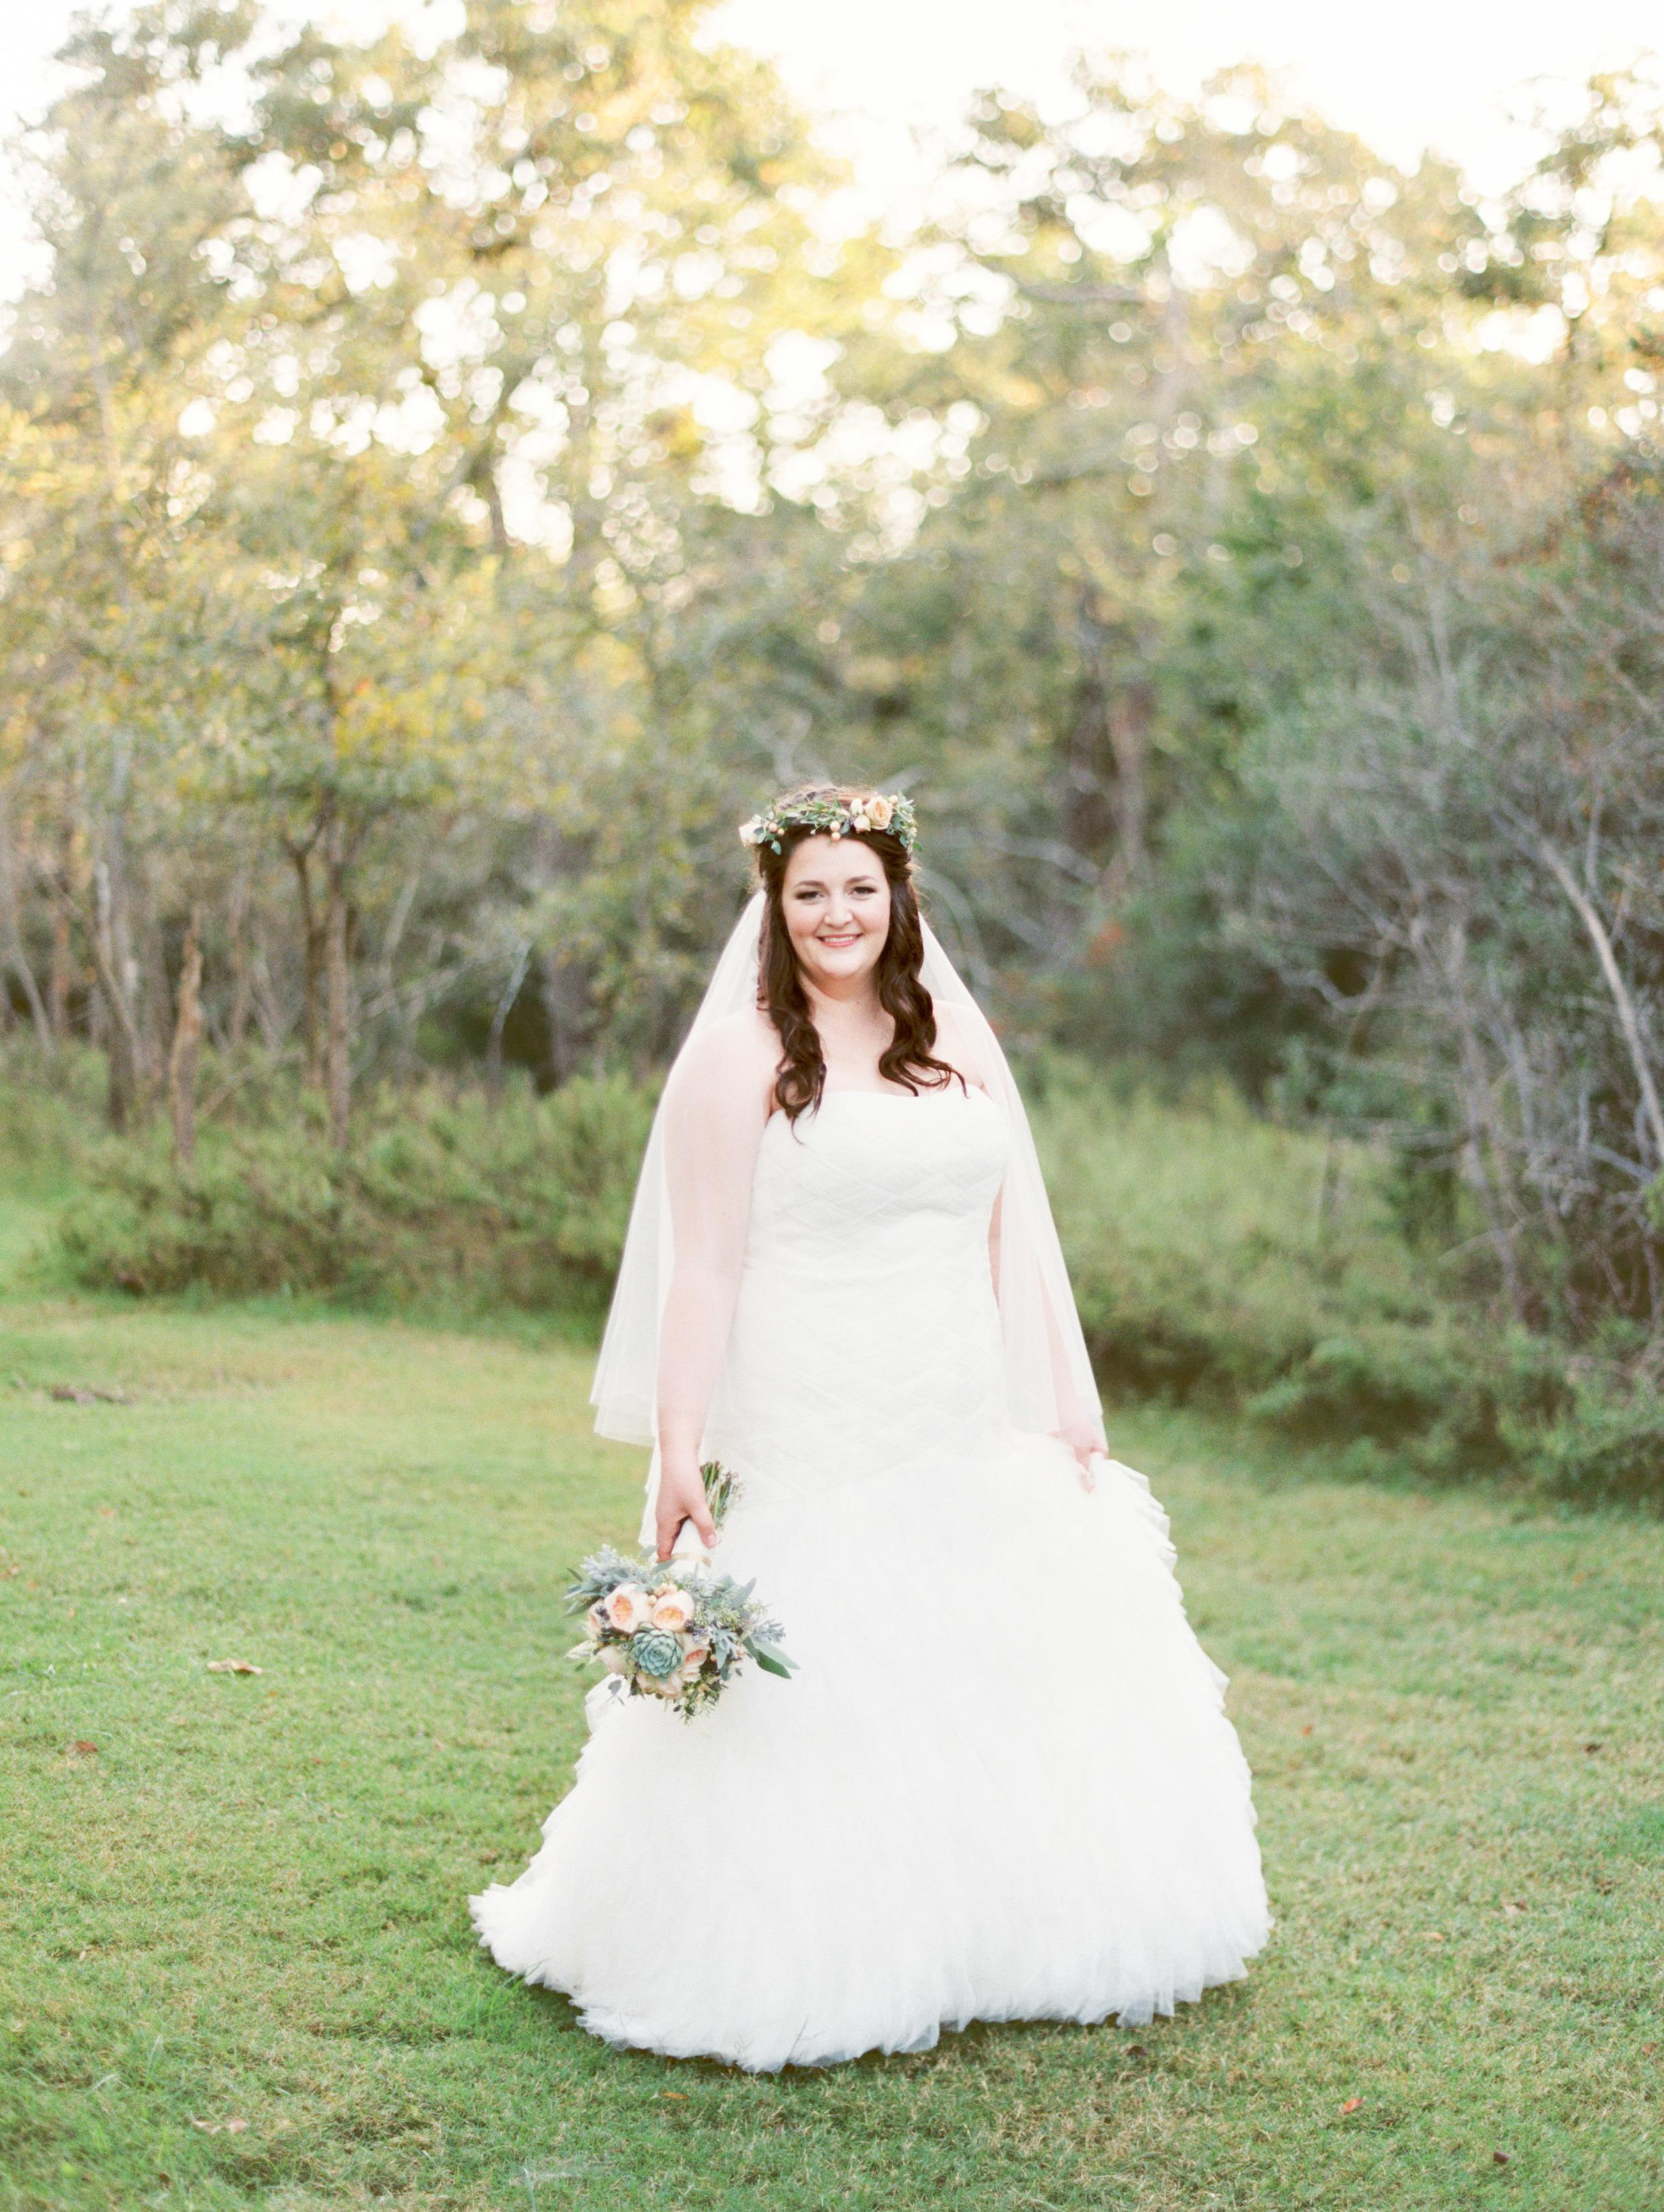 Sarah Best Photography - Elizabeth's Bridals - 7F Lodge-117.jpg